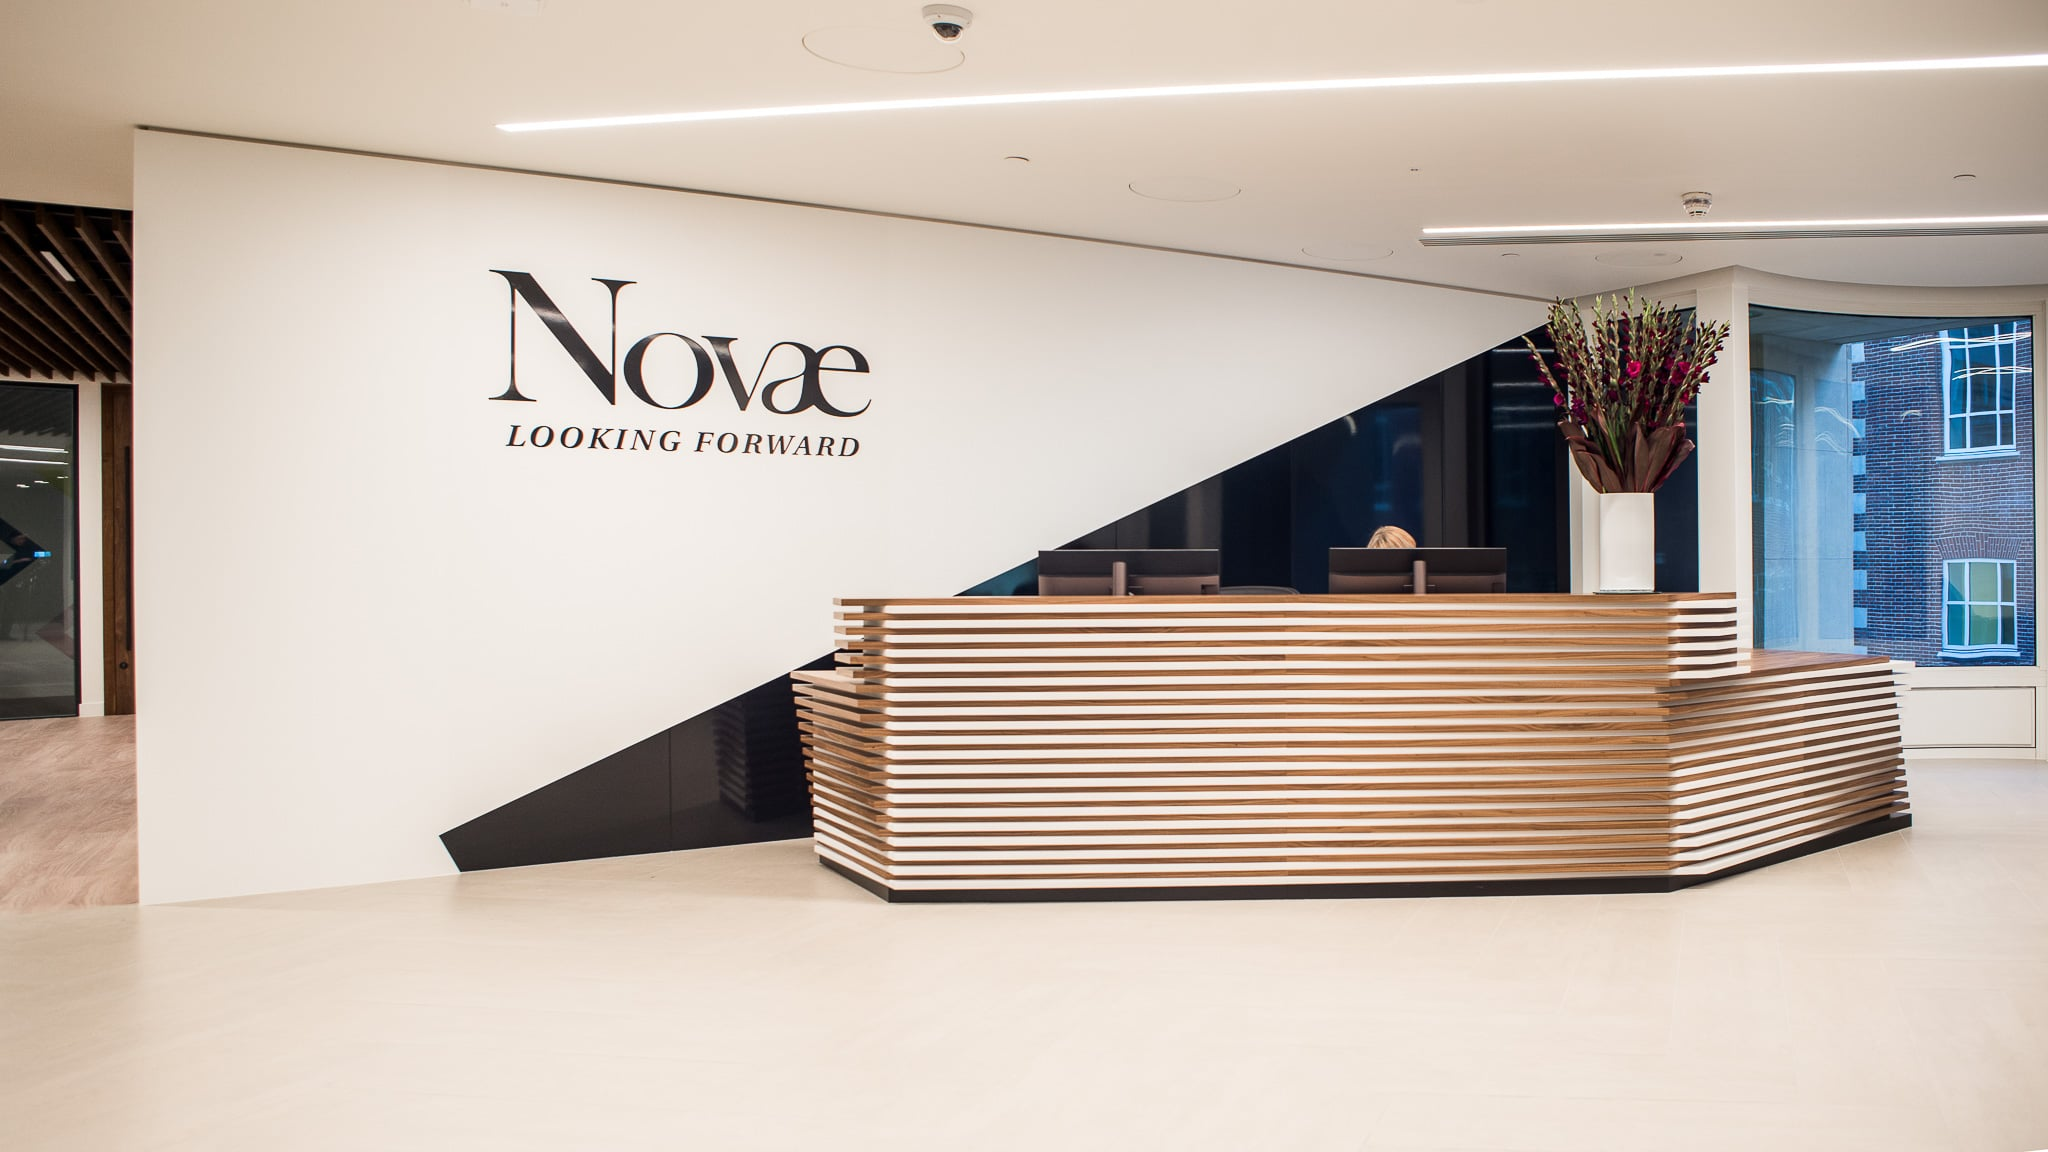 Novae-005.jpg